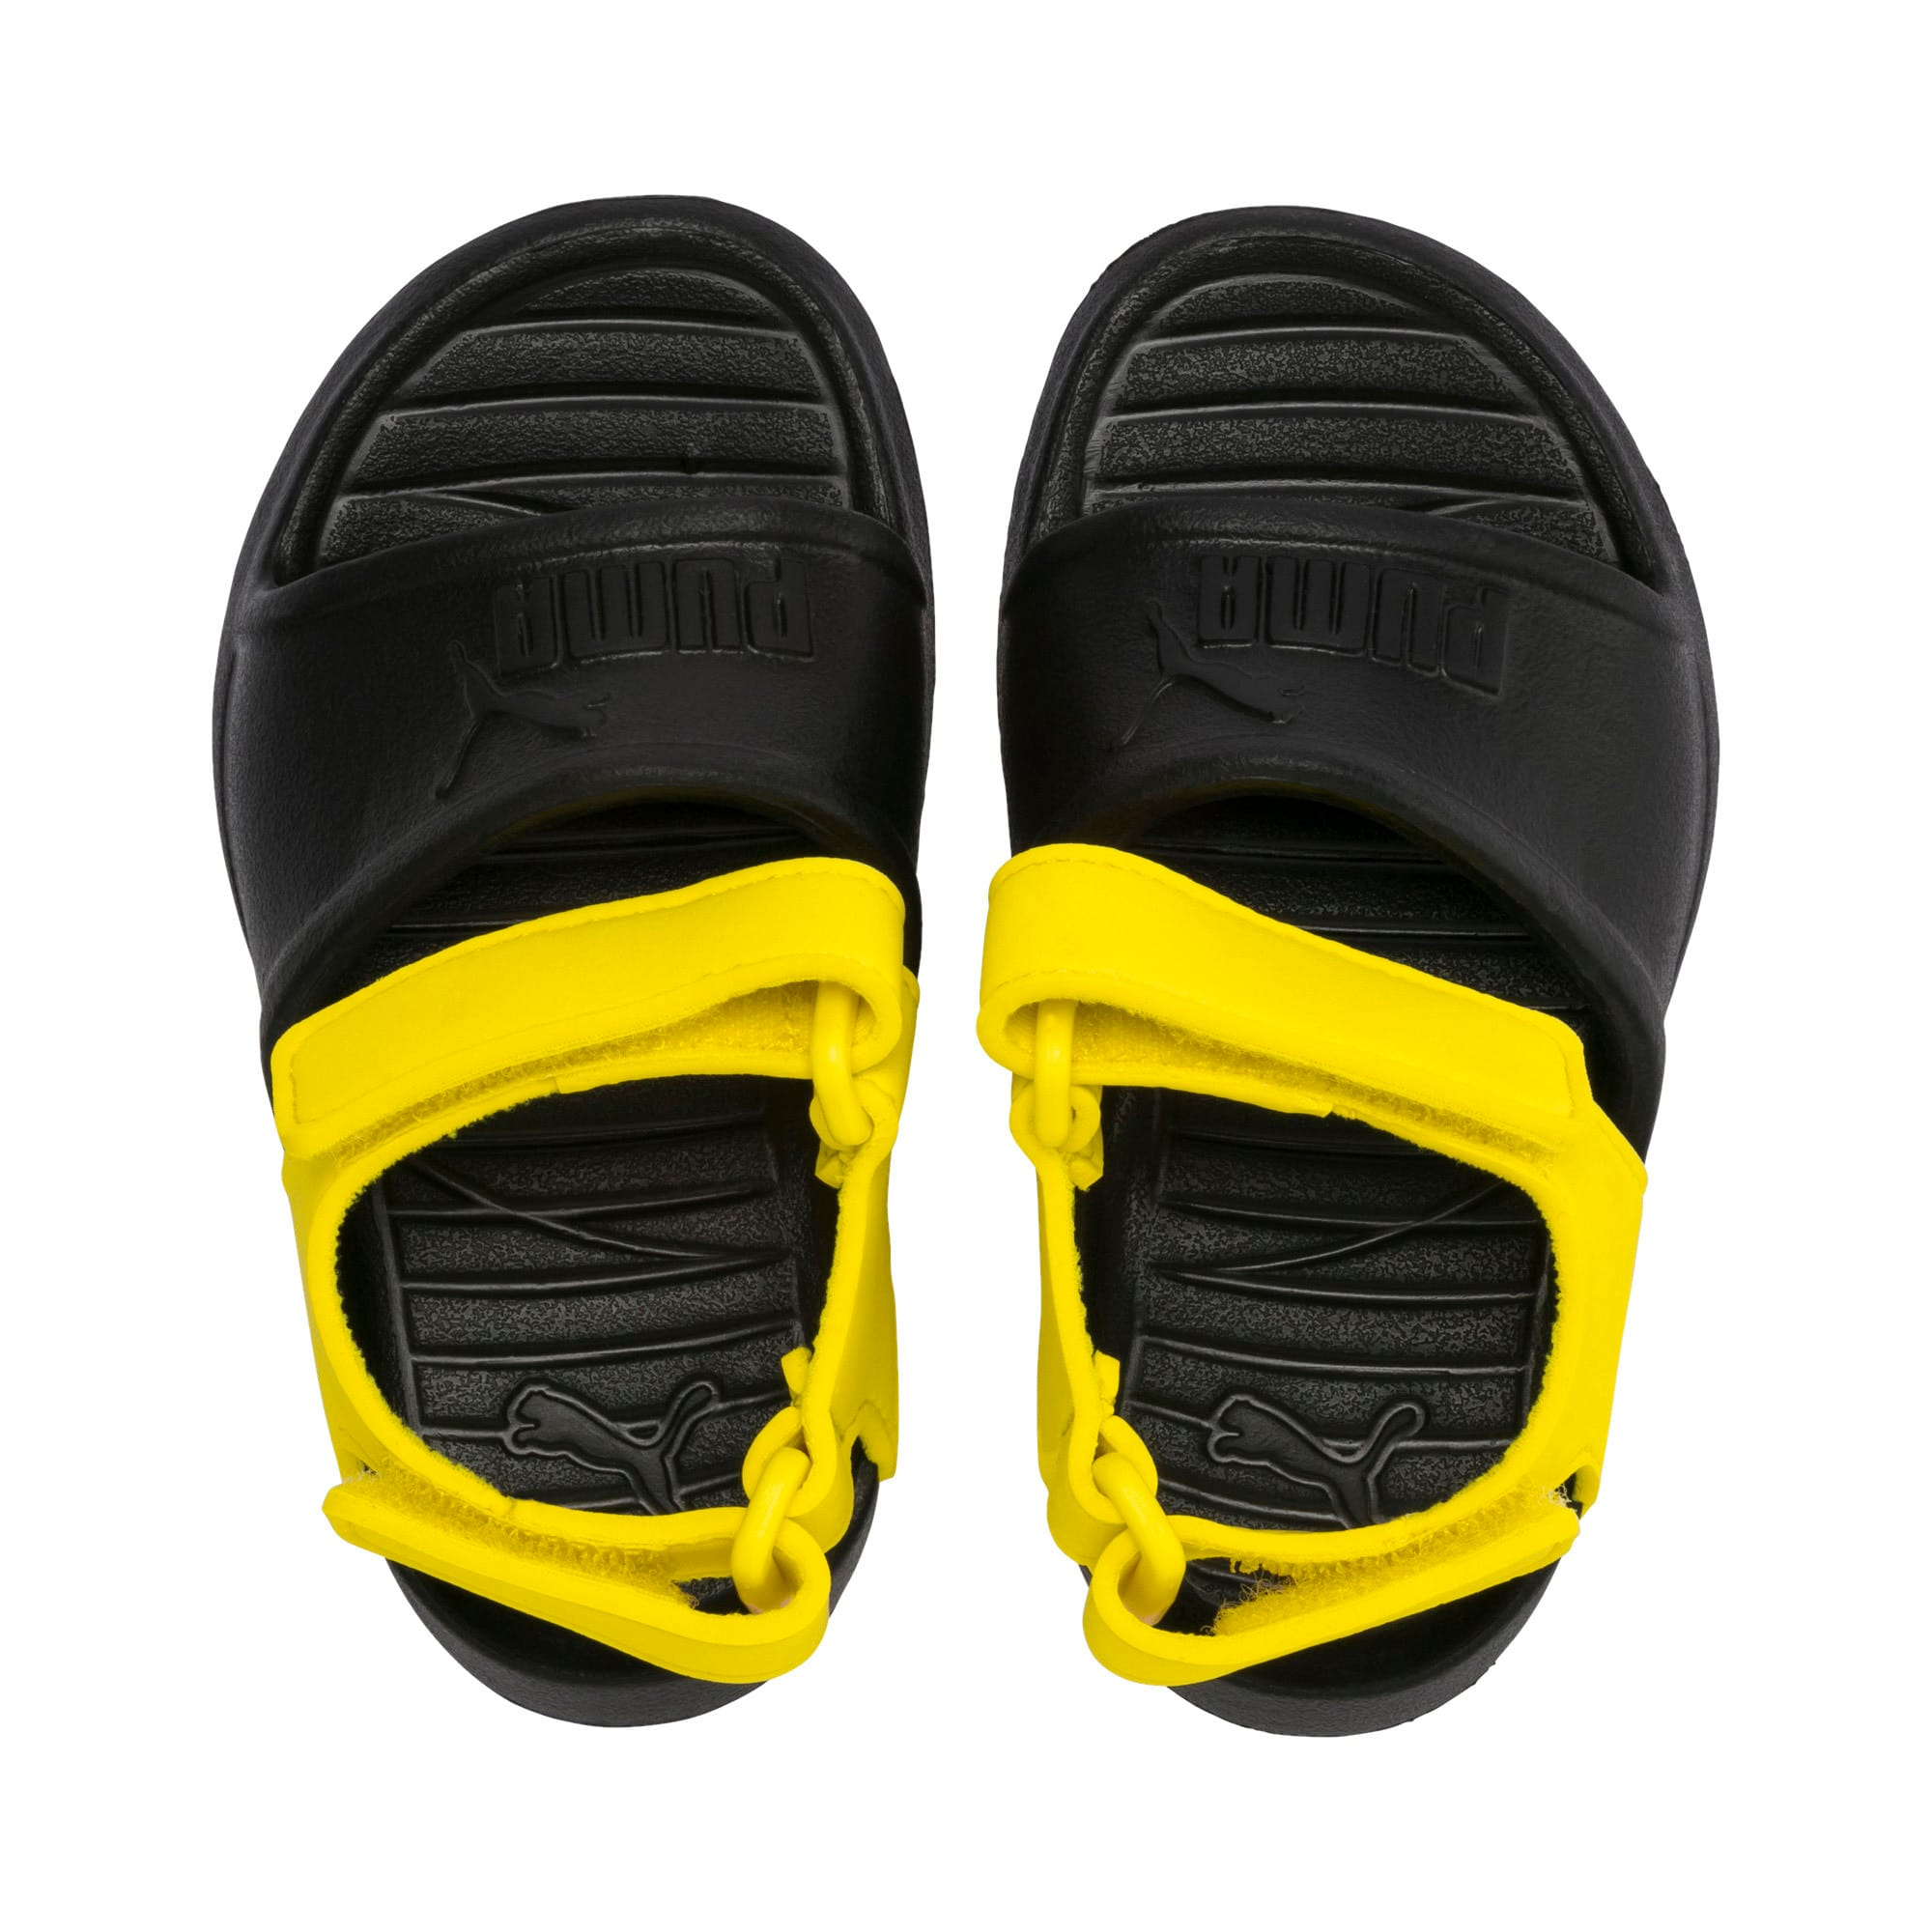 Thumbnail 6 of Divecat v2 Injex Kids' Sandals, Puma Black-Blazing Yellow, medium